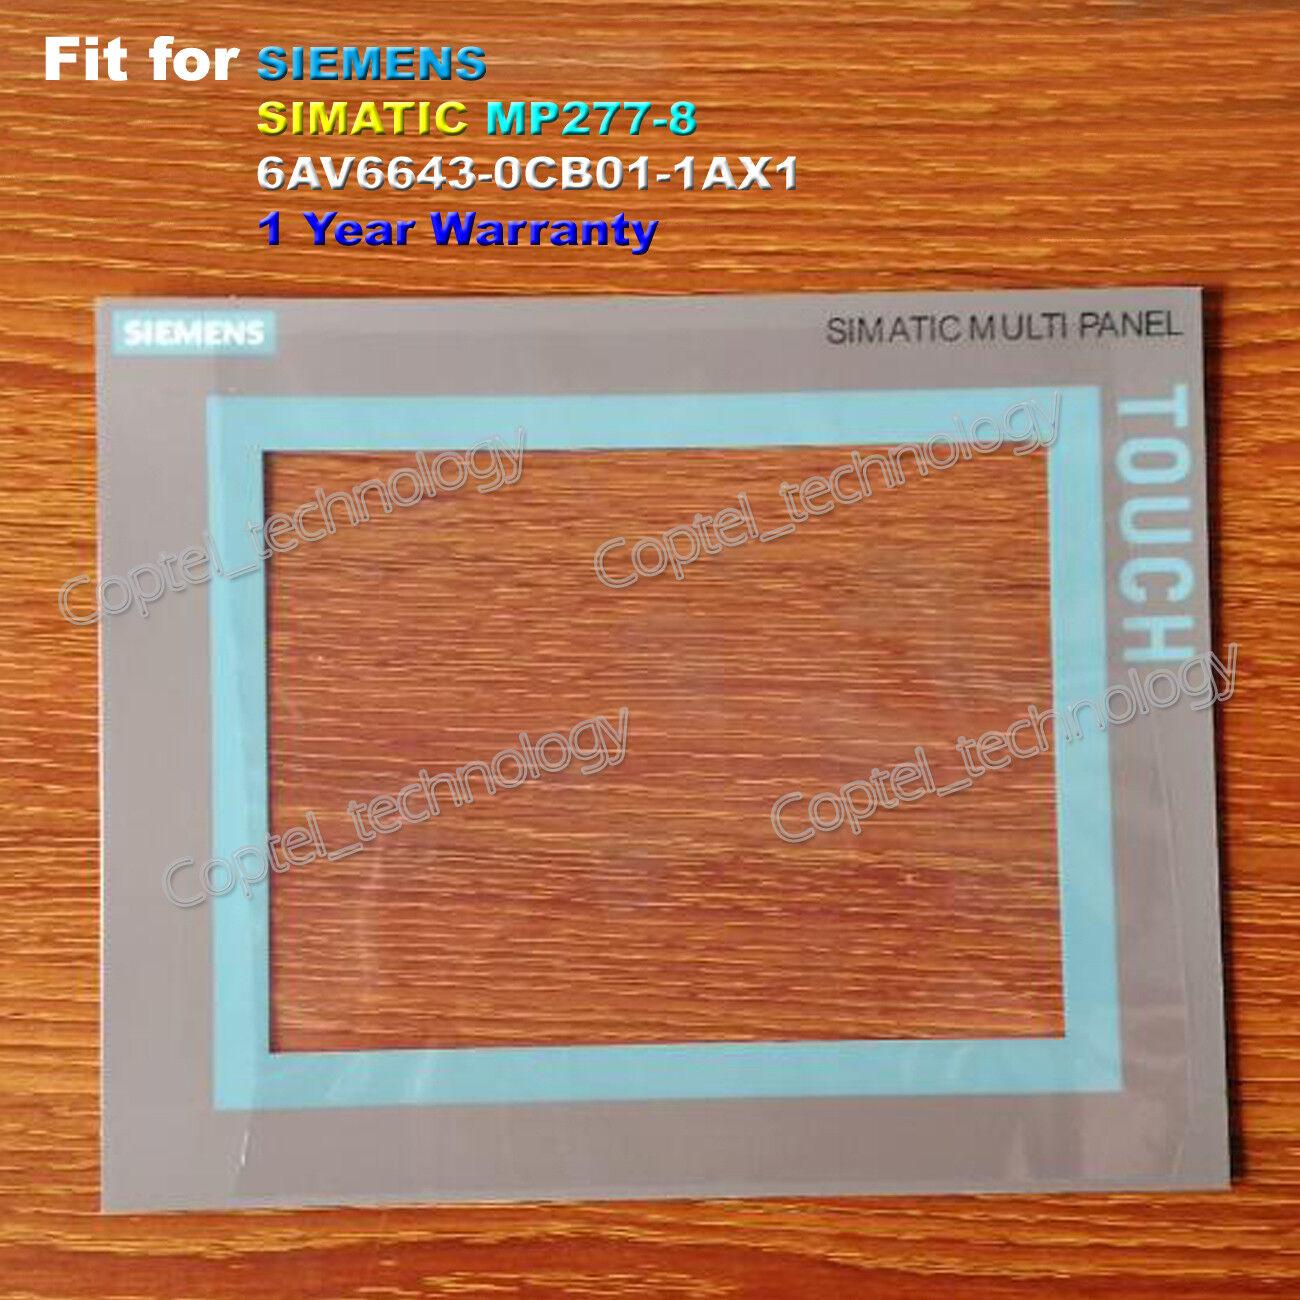 For SIEMENS MP277-8 6AV6643-0CB01-1AX1 6AV6 643-0CB01-1AX1 Predective Film